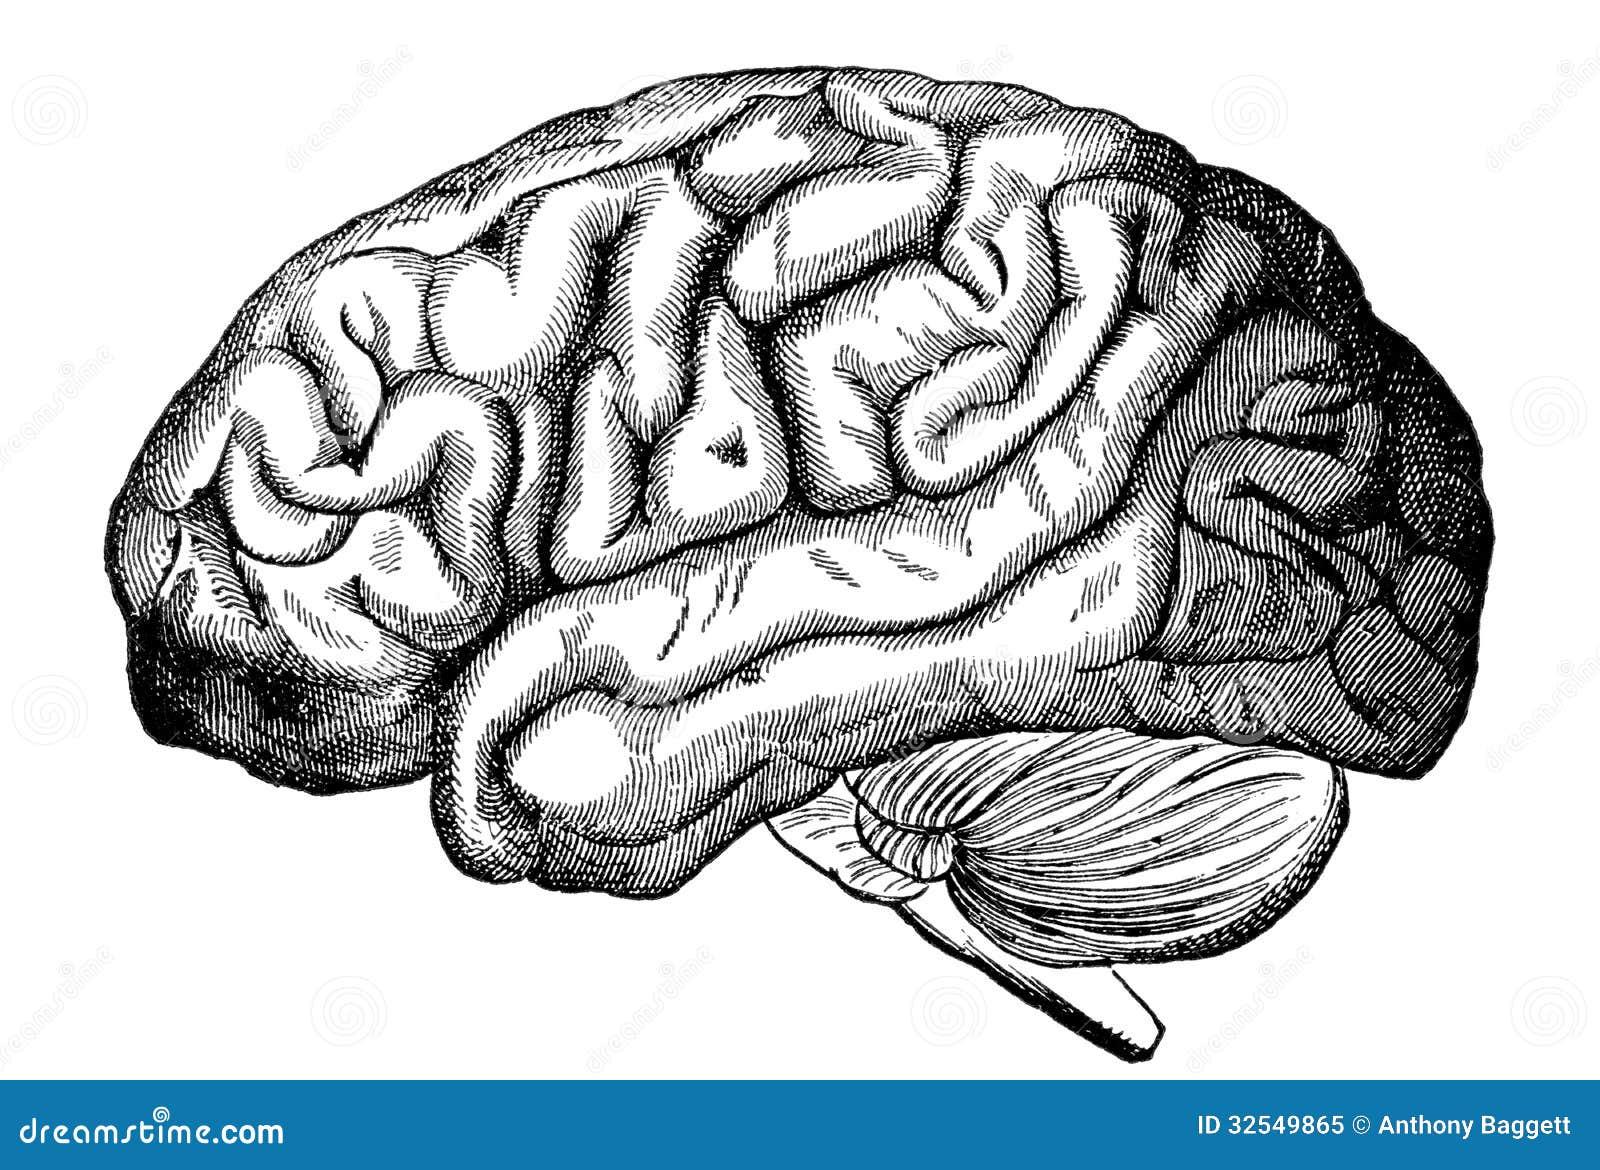 Human brain stock illustration. Illustration of biology - 32549865